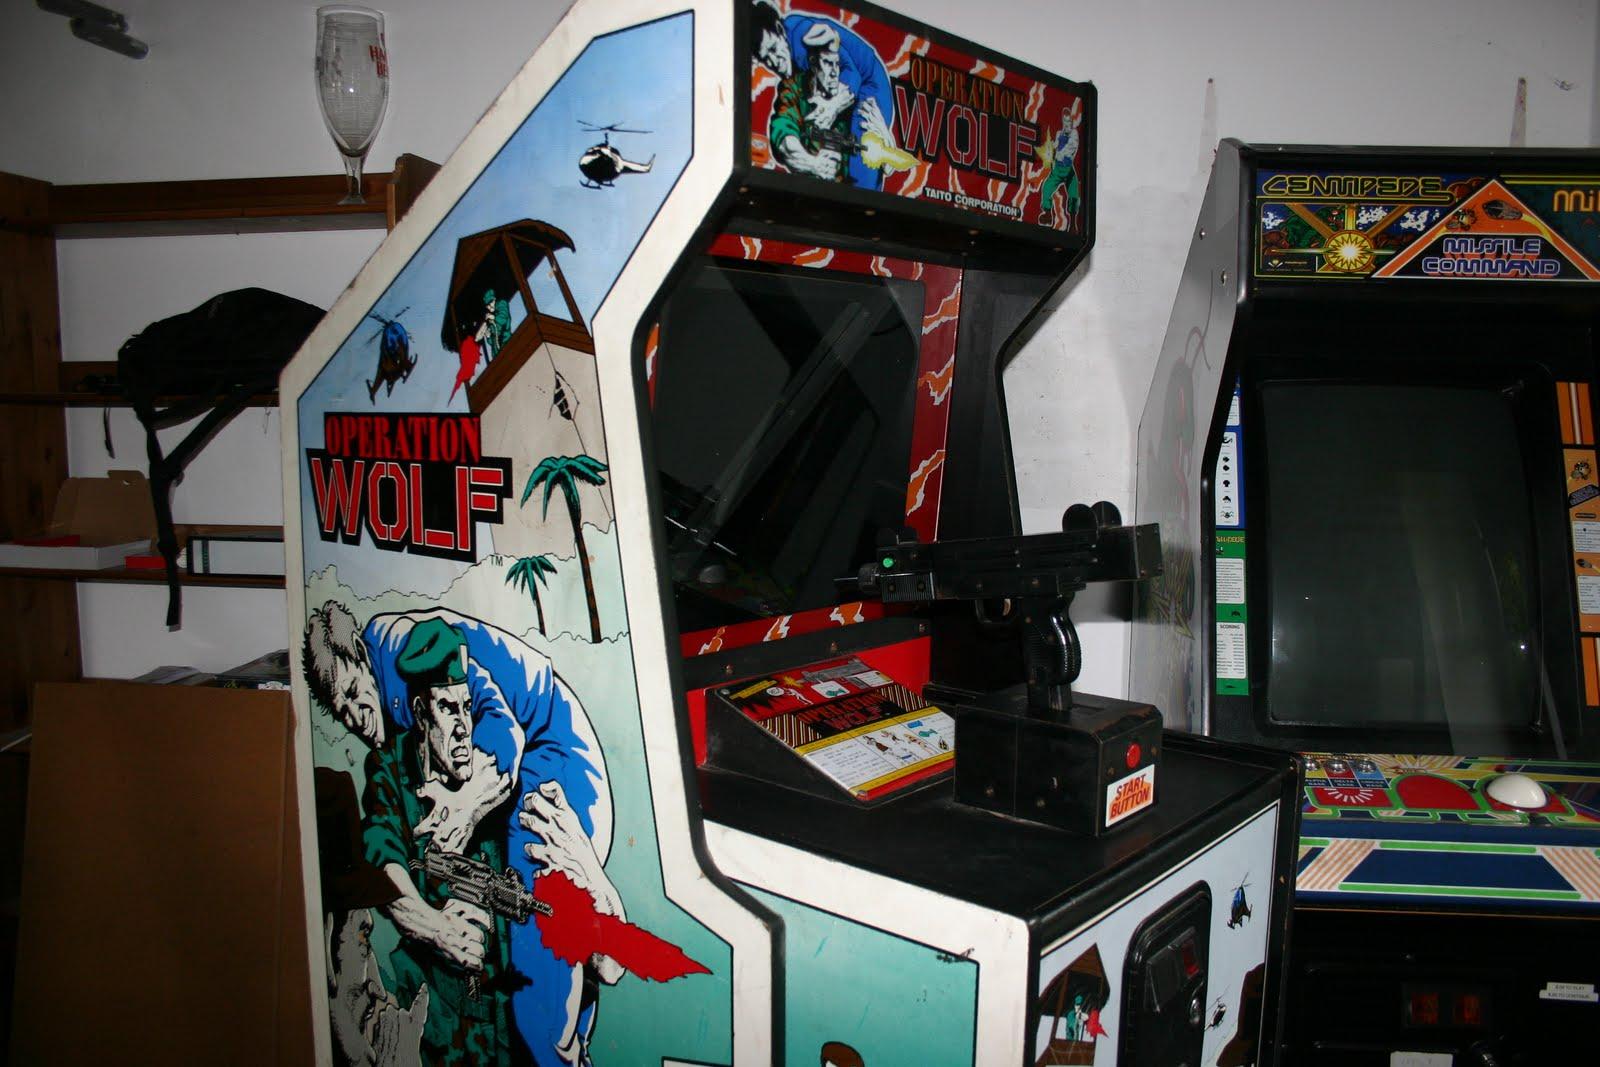 arcade and modding operation wolf repair log